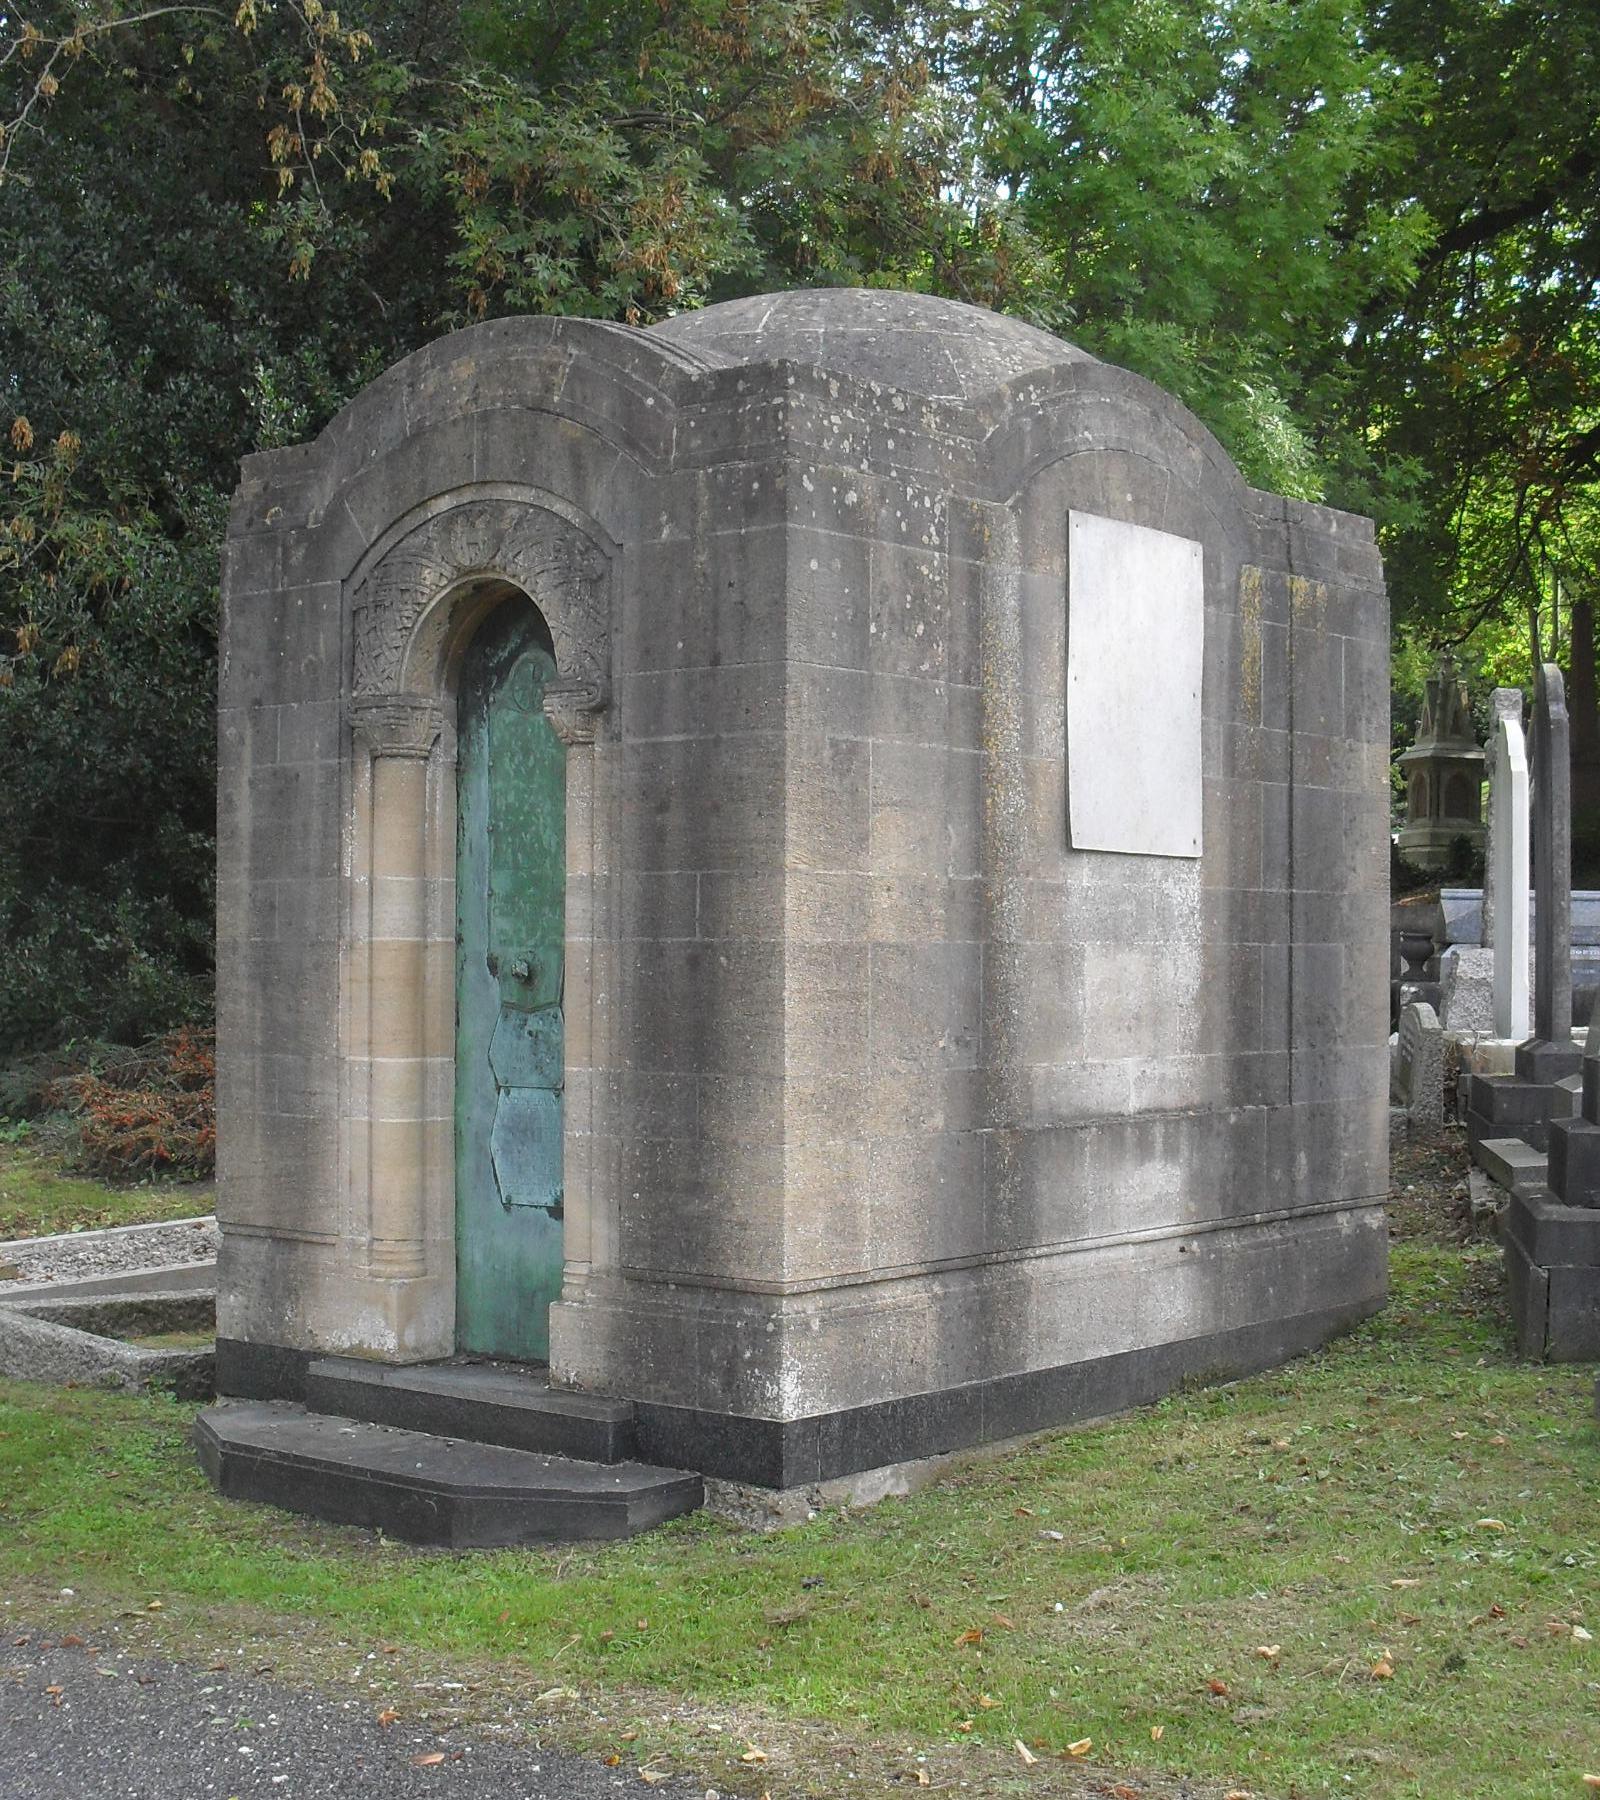 Cemeteries and crematoria in brighton and hove for Extra mural cemetery brighton